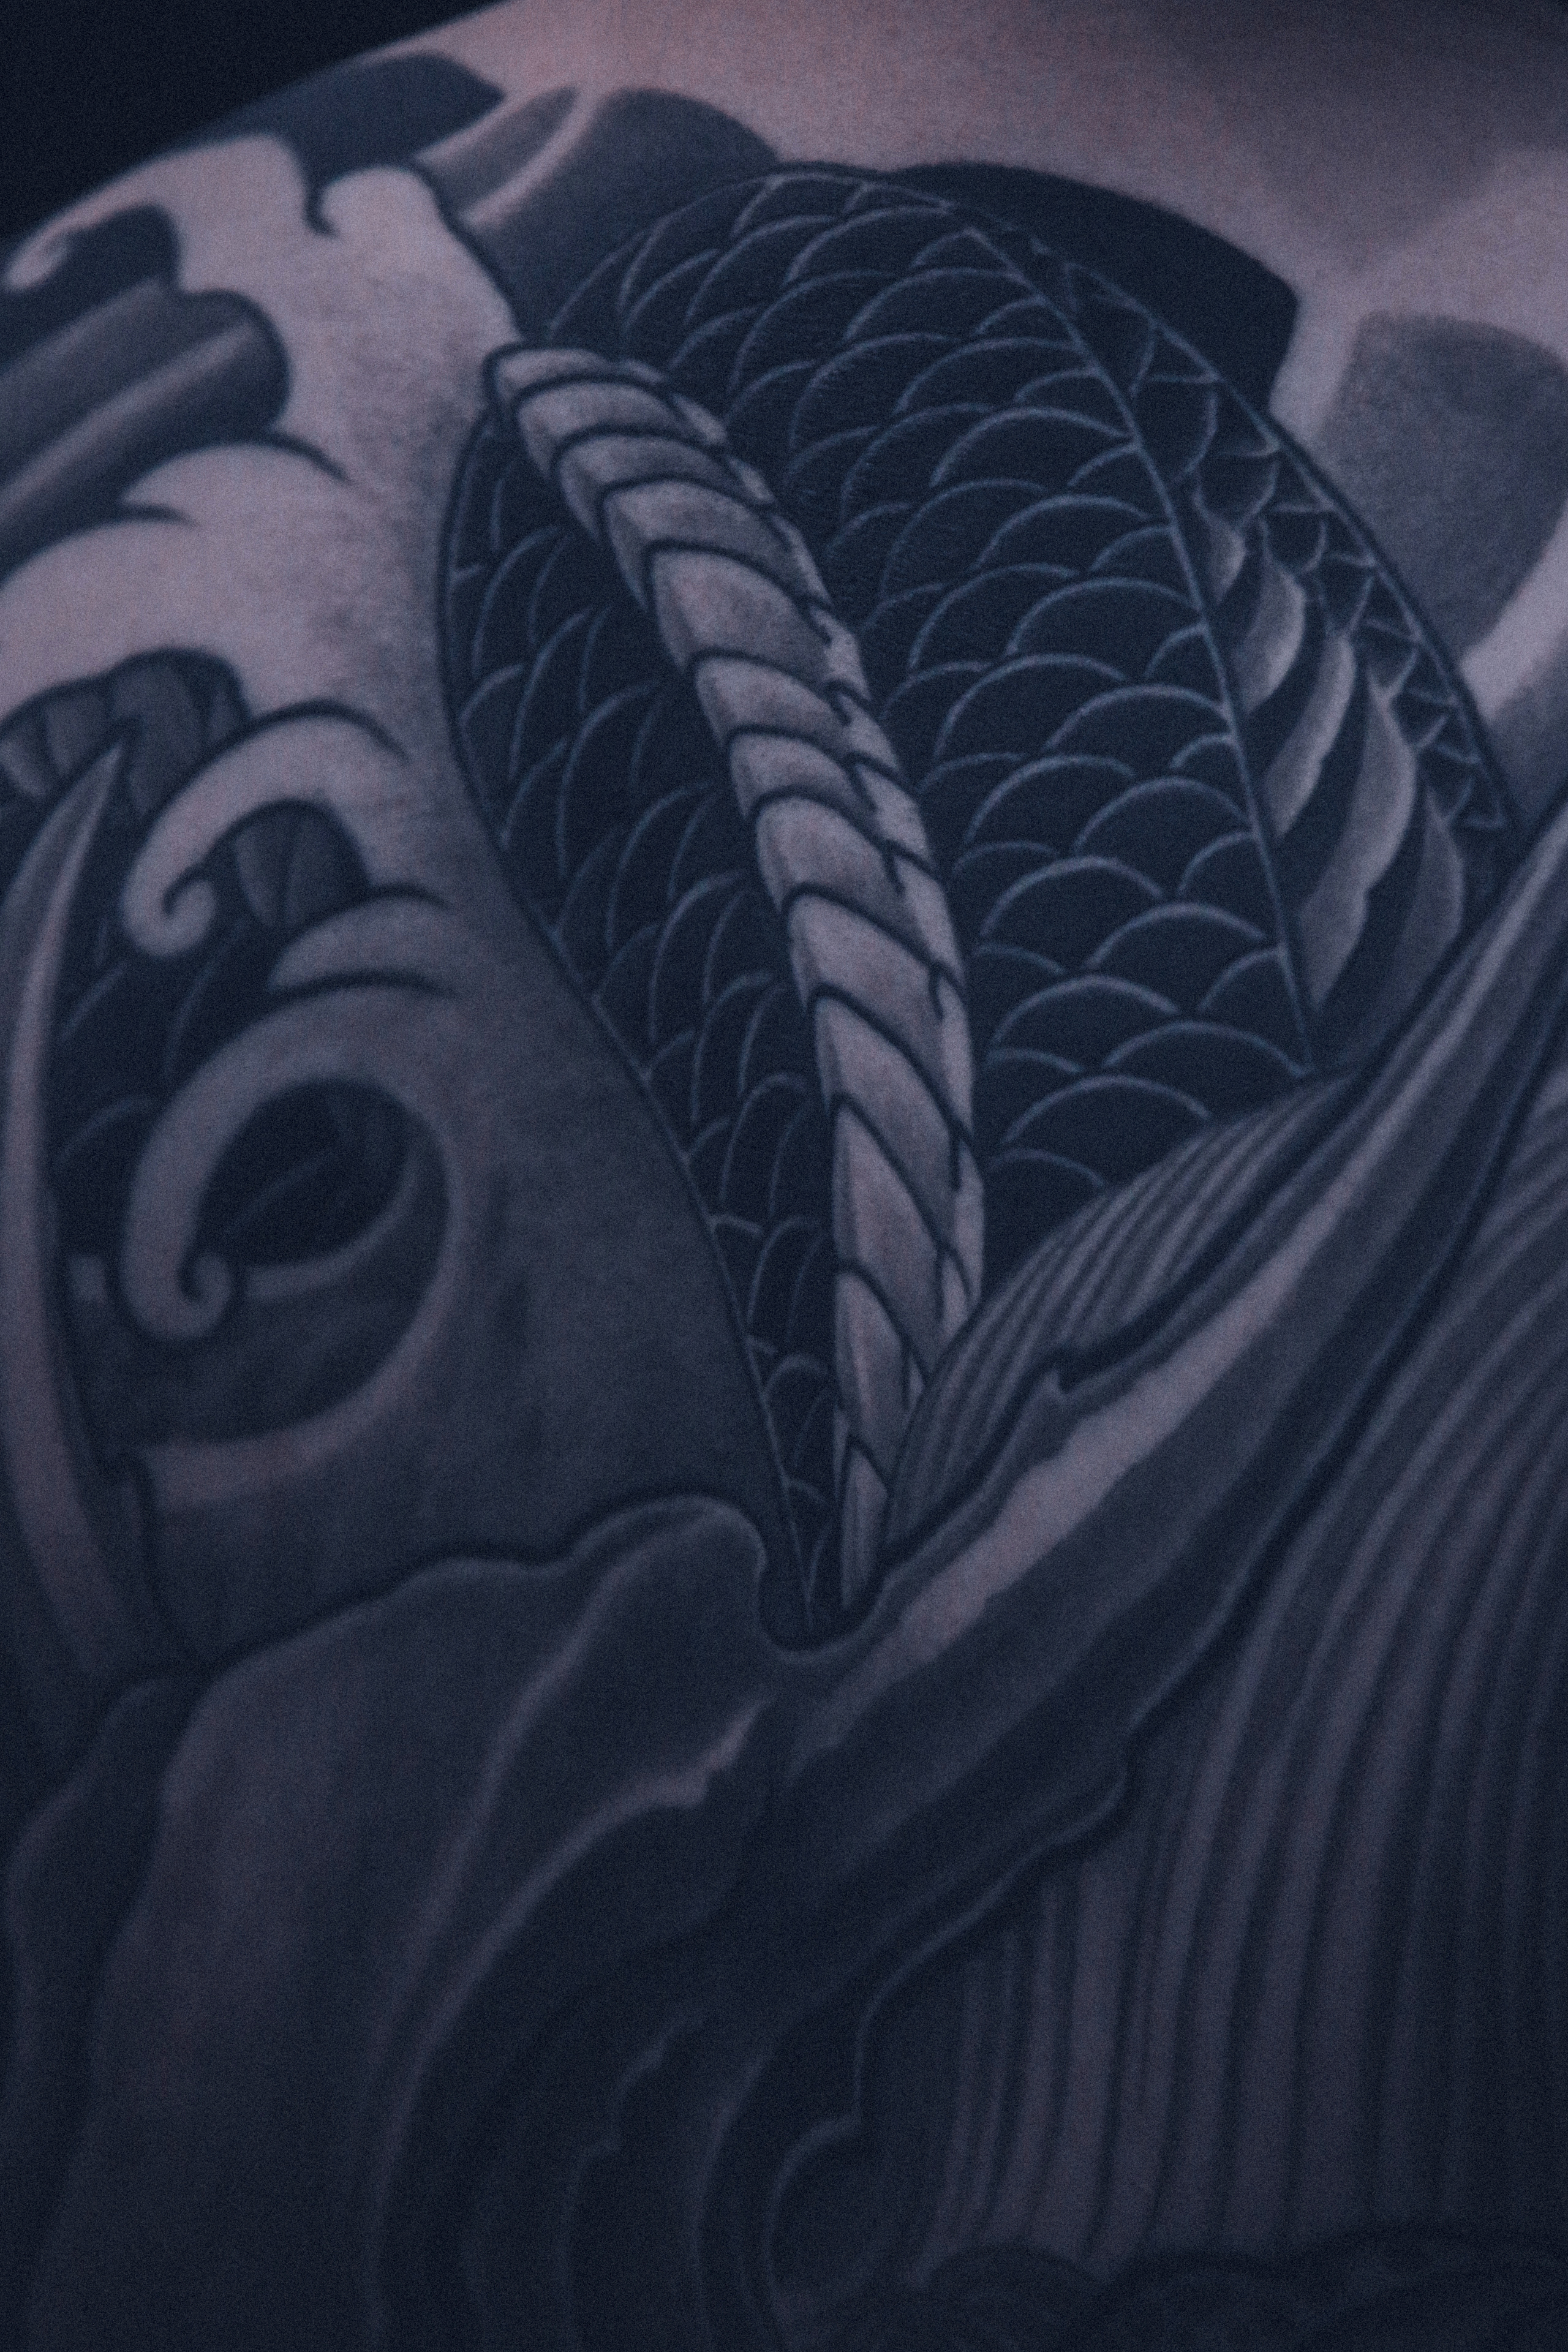 【墨魂】之三 -SKIN DELIRIUM-